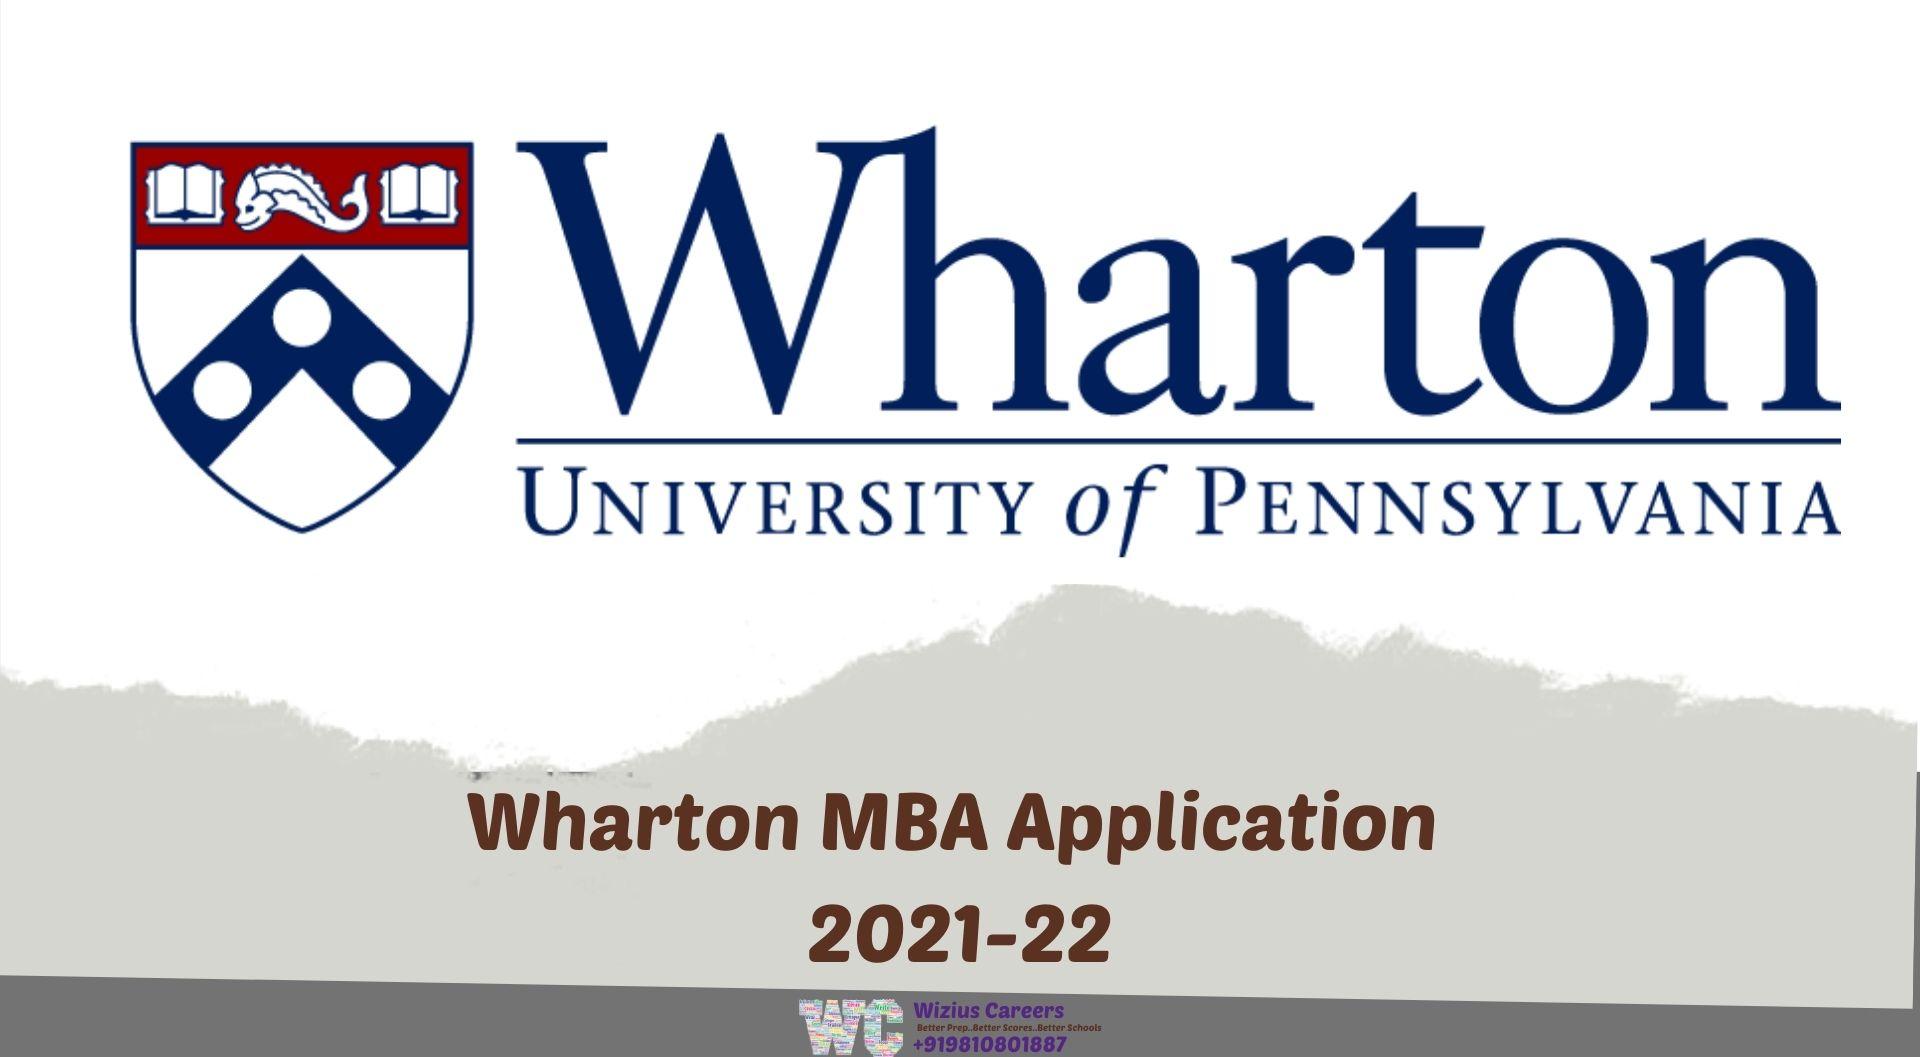 Wharton MBA Application 2021-22